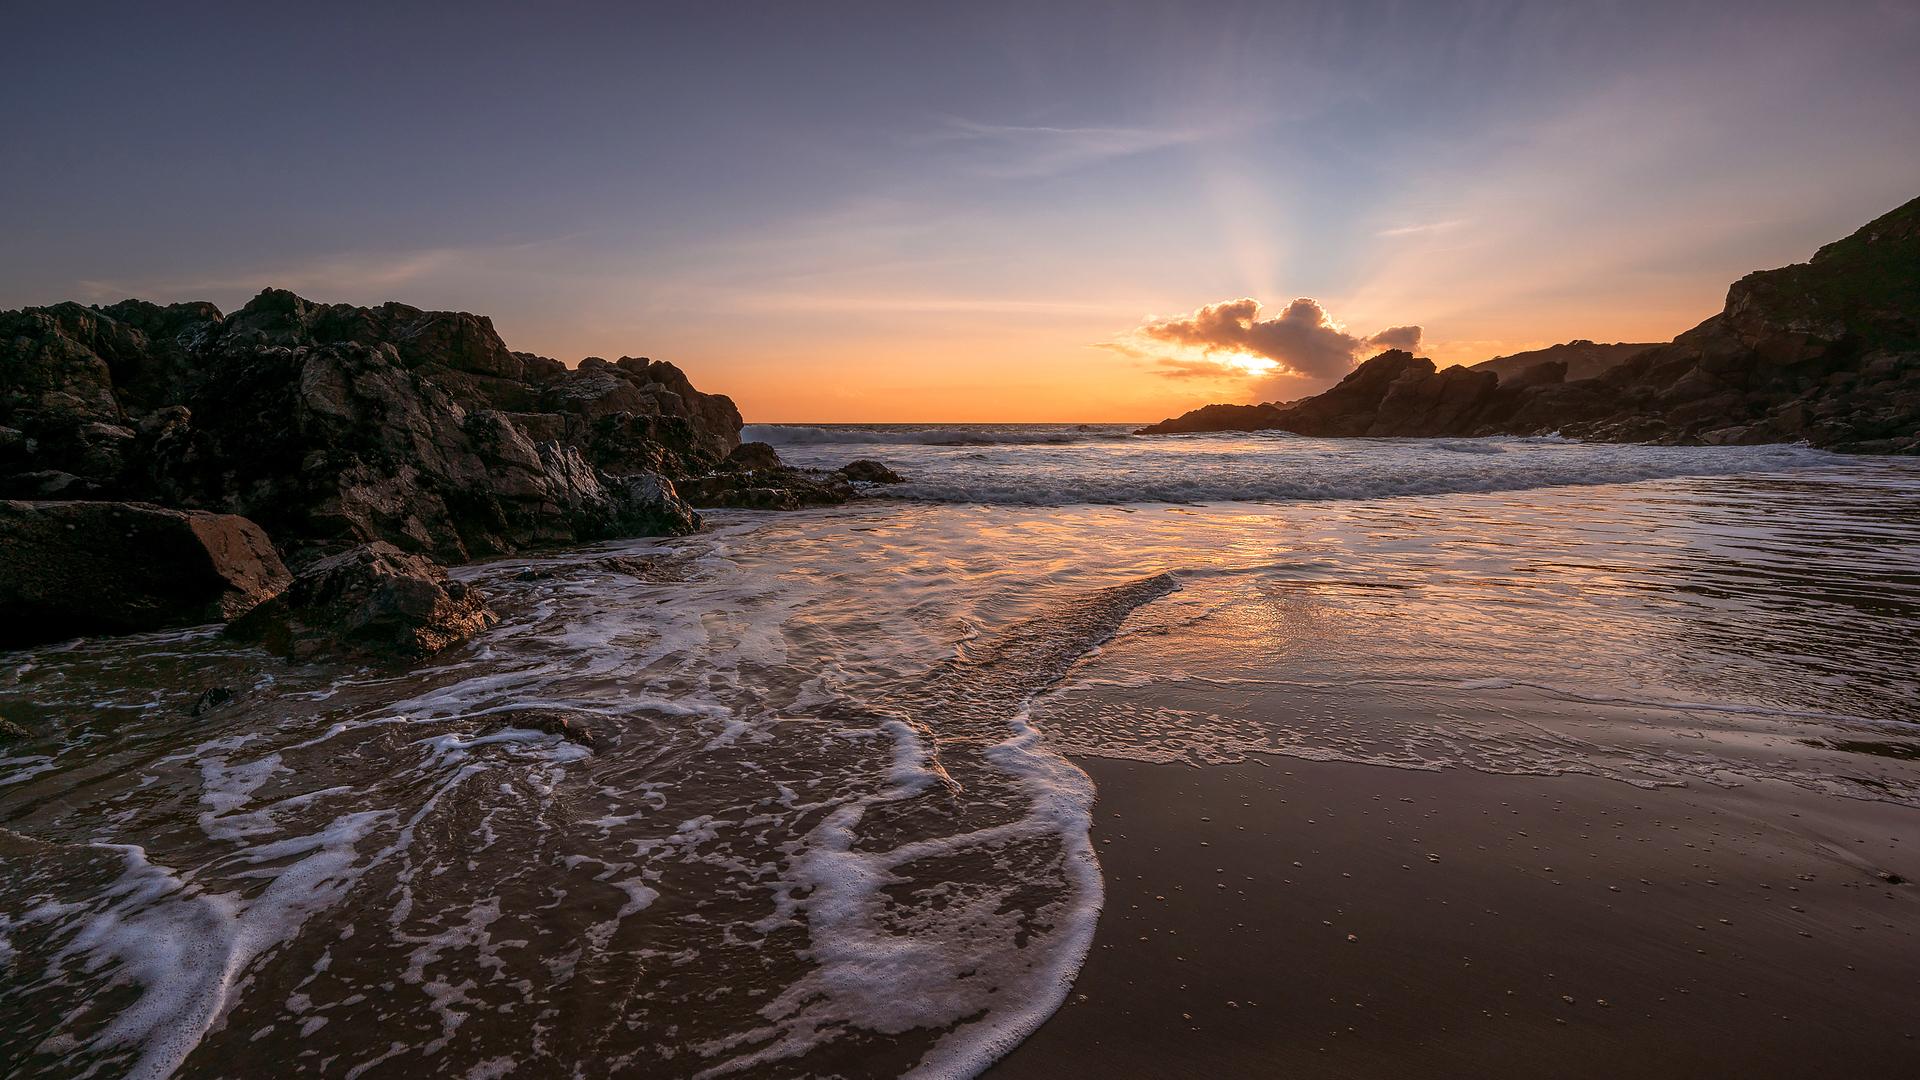 General 1920x1080 nature landscape sky clouds beach rocks sea sunset sand